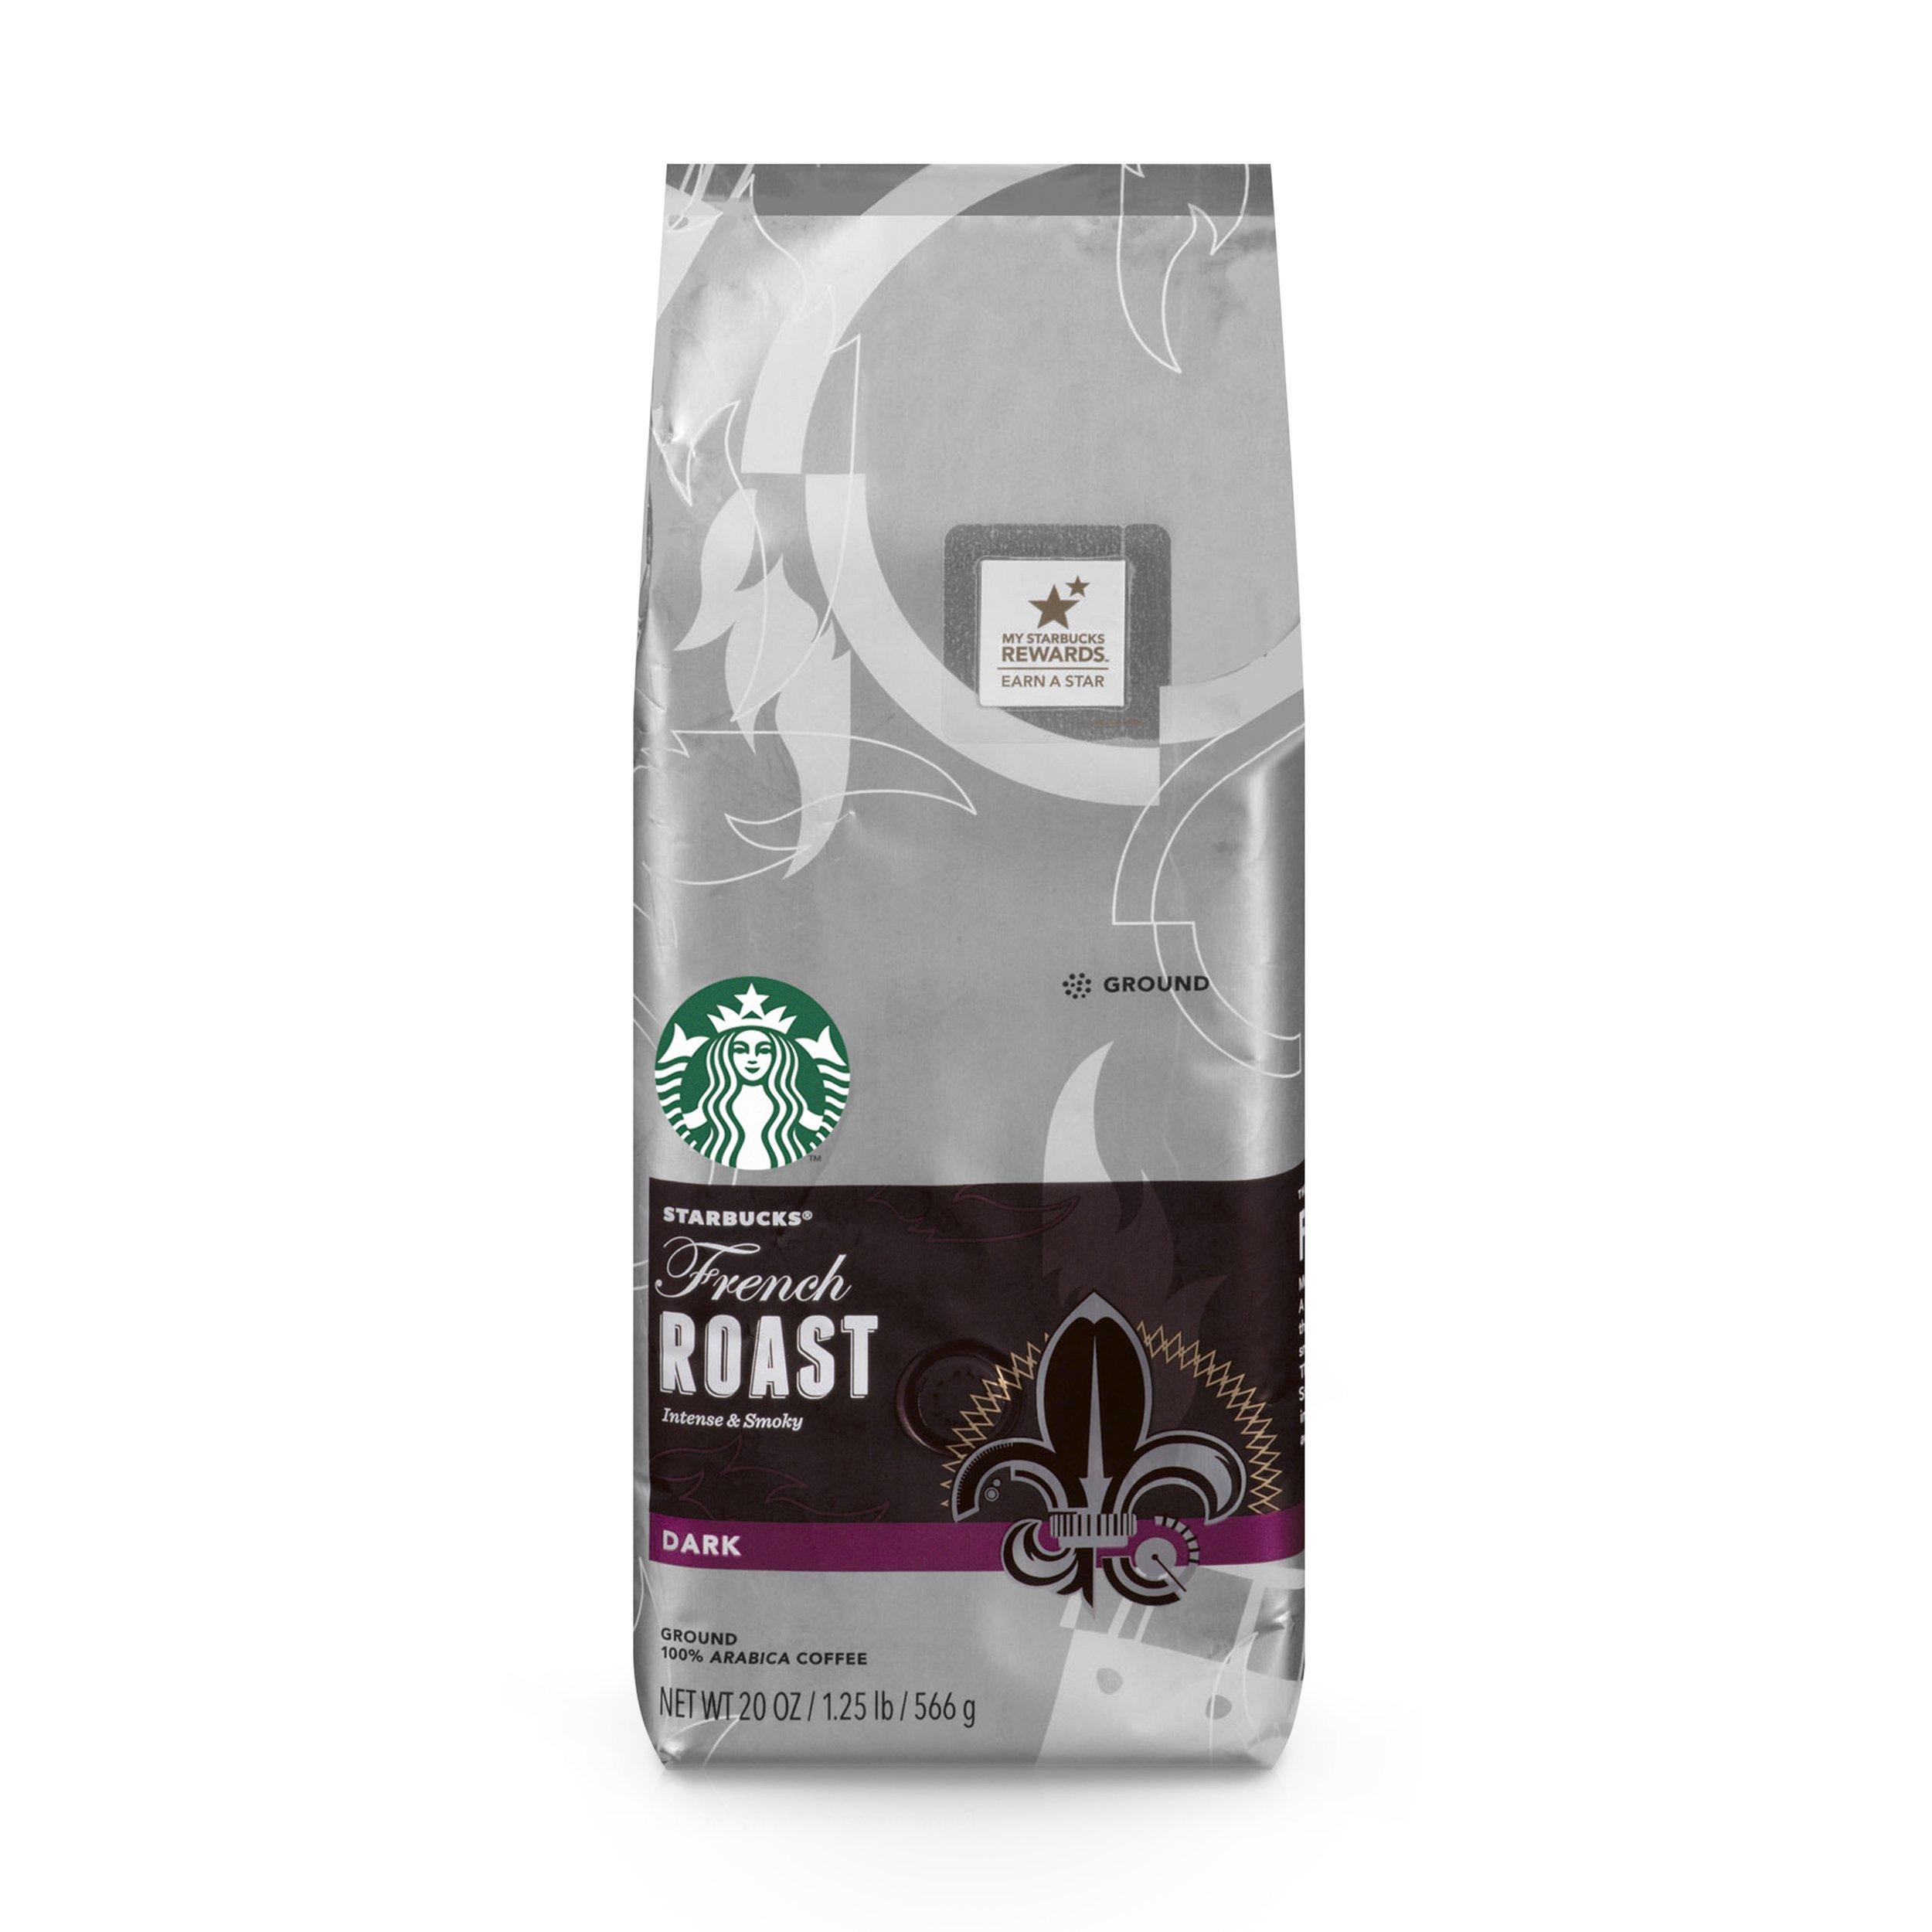 Starbucks French Roast Dark Roast Ground Coffee, 20-Ounce Bag by Starbucks